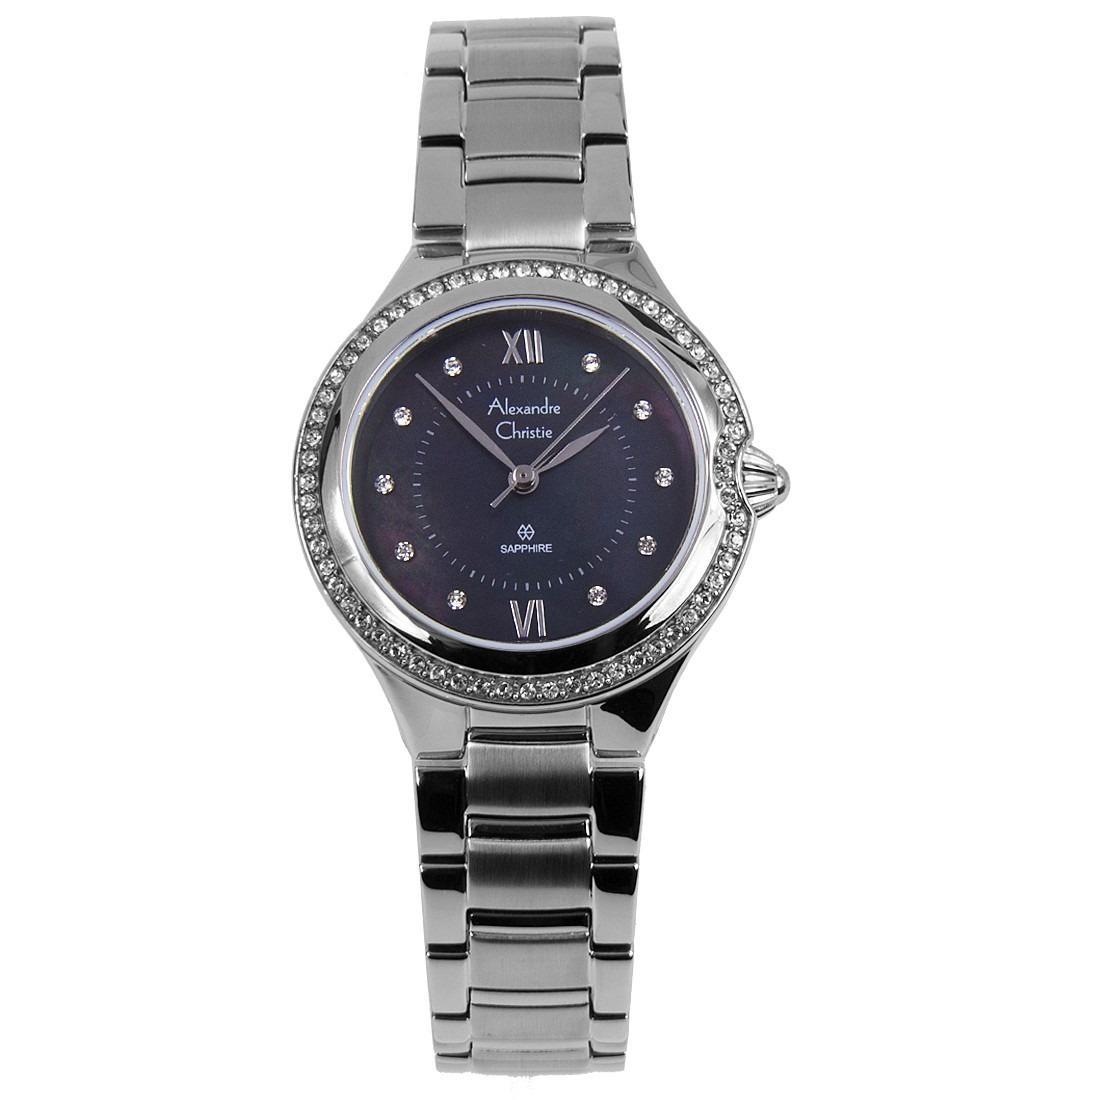 Latest Alexandre Christie Watches Products Enjoy Huge Discounts Ac 6410 Black Strap Men Original Sapphire Analog Stainless Steel Watch 2665lhbssmr